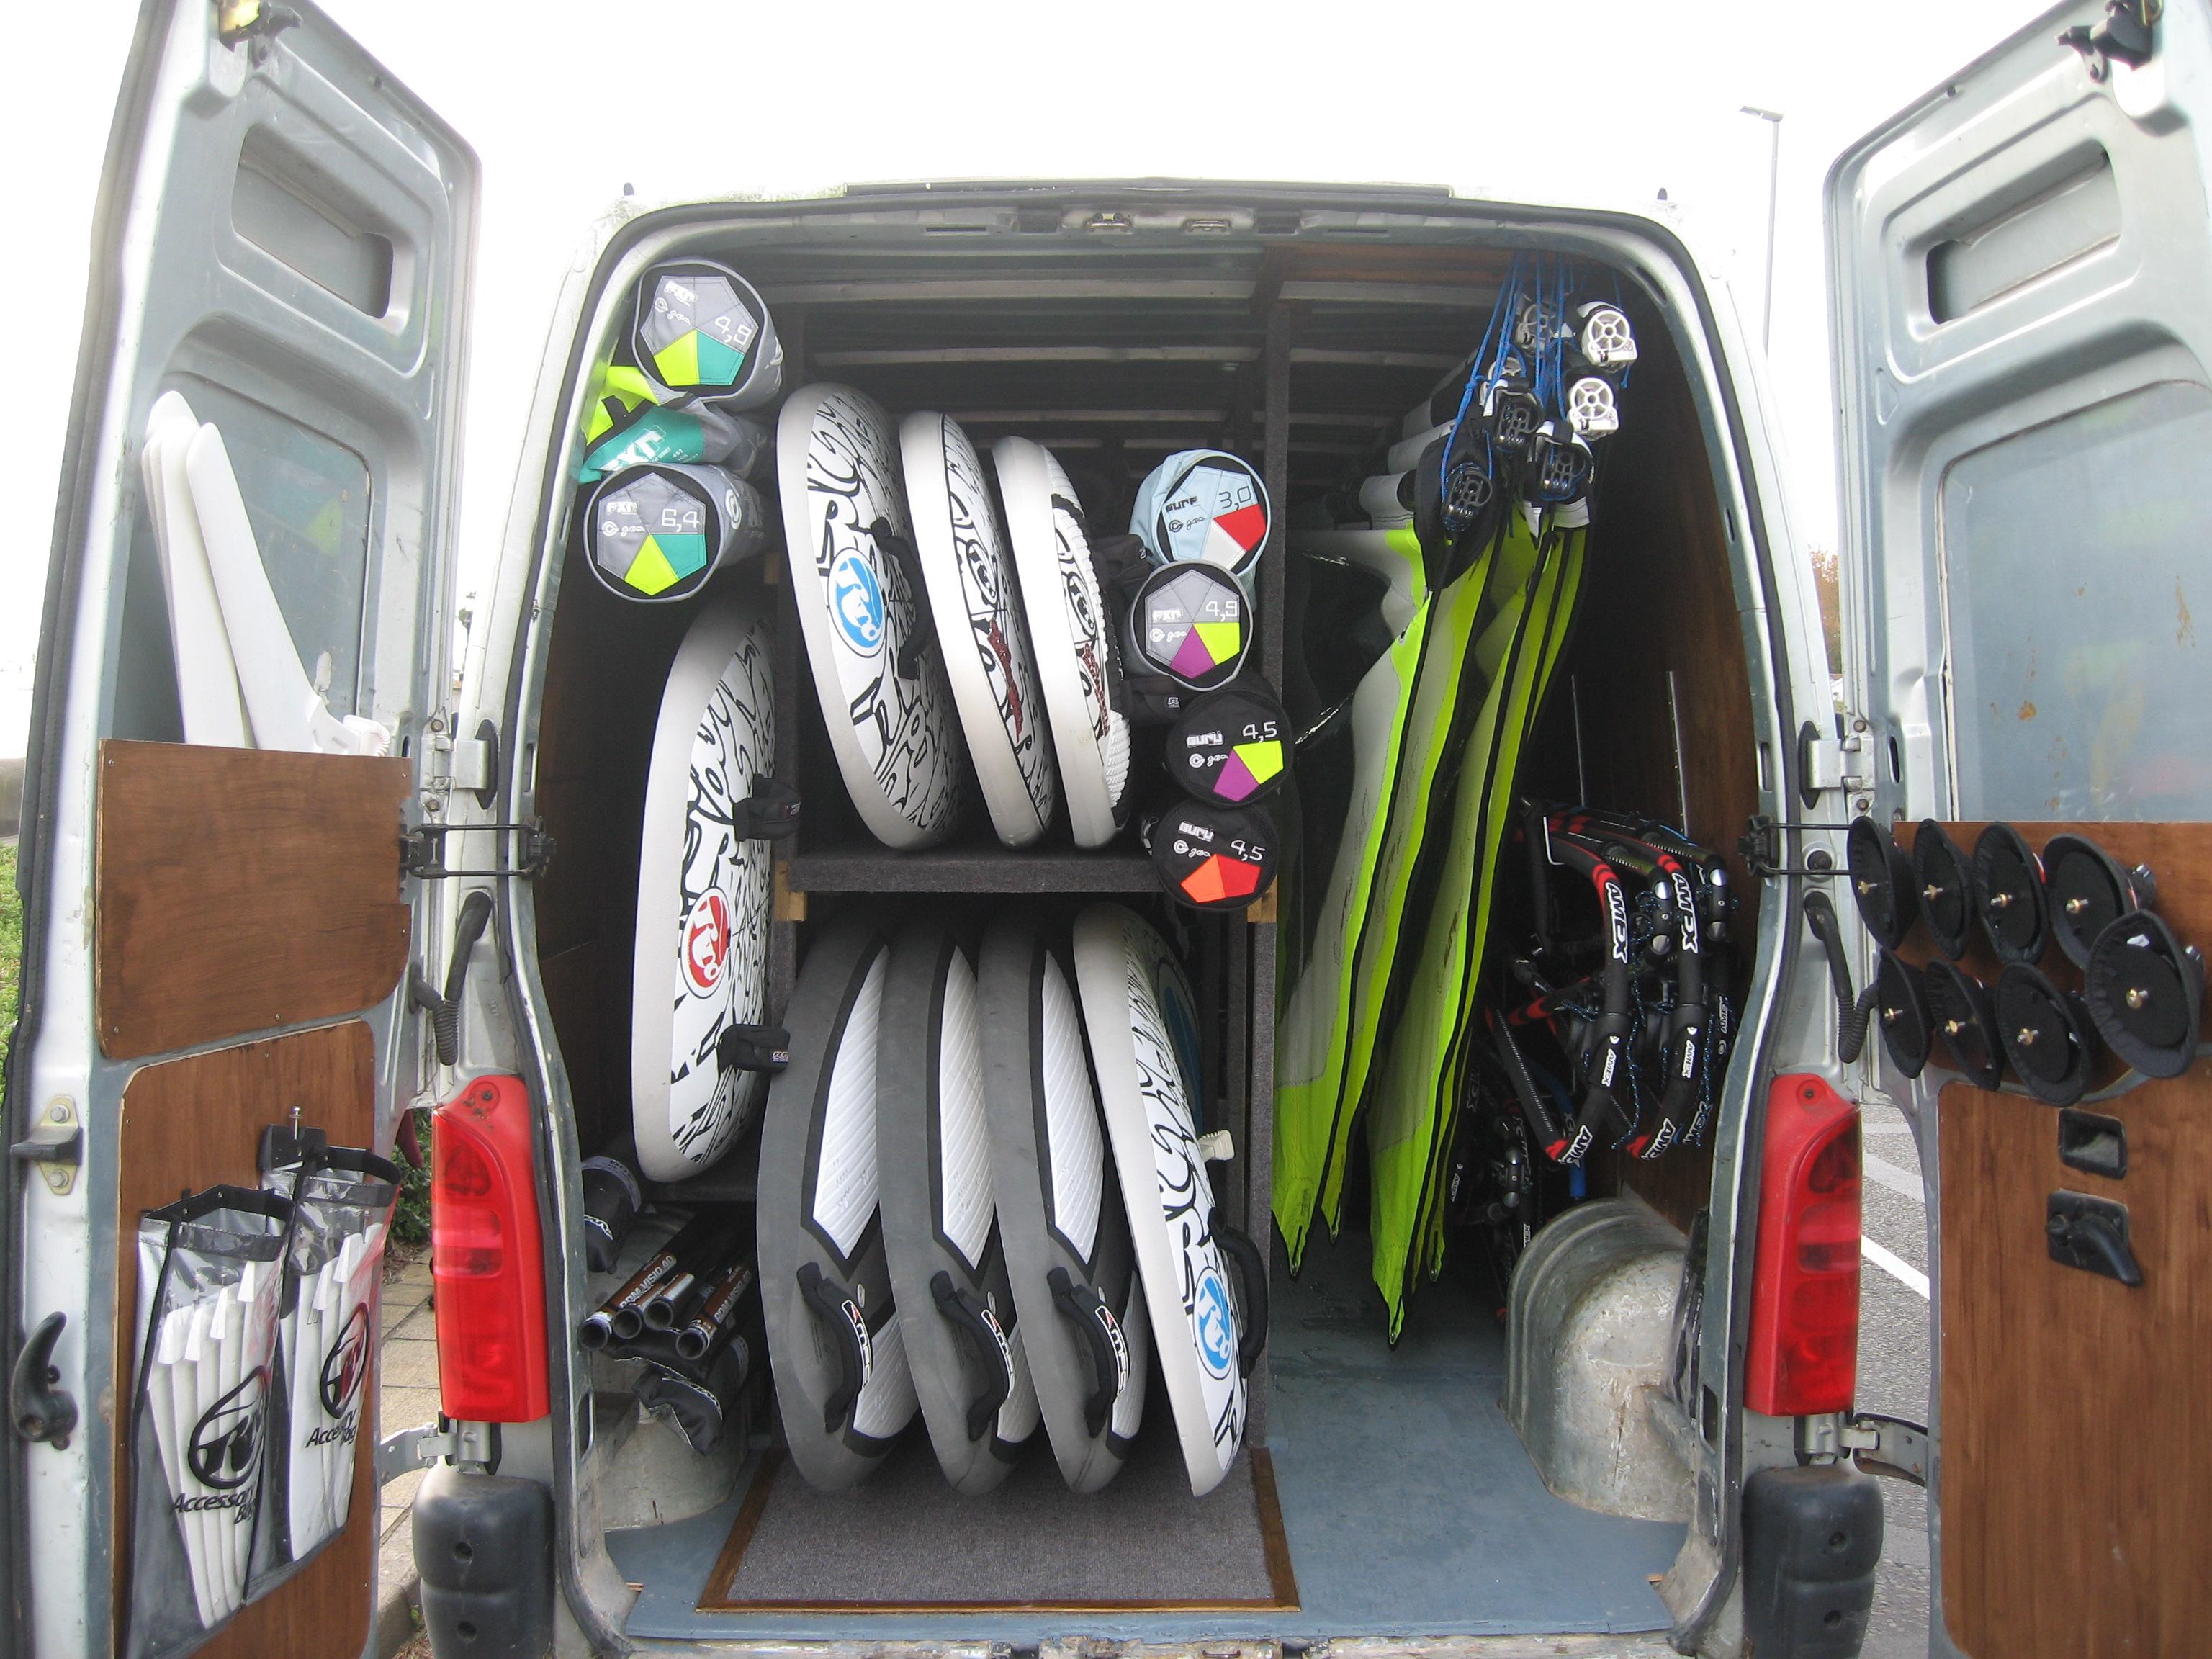 Brand New Windsurfing Equipment at Poole Windsurfing